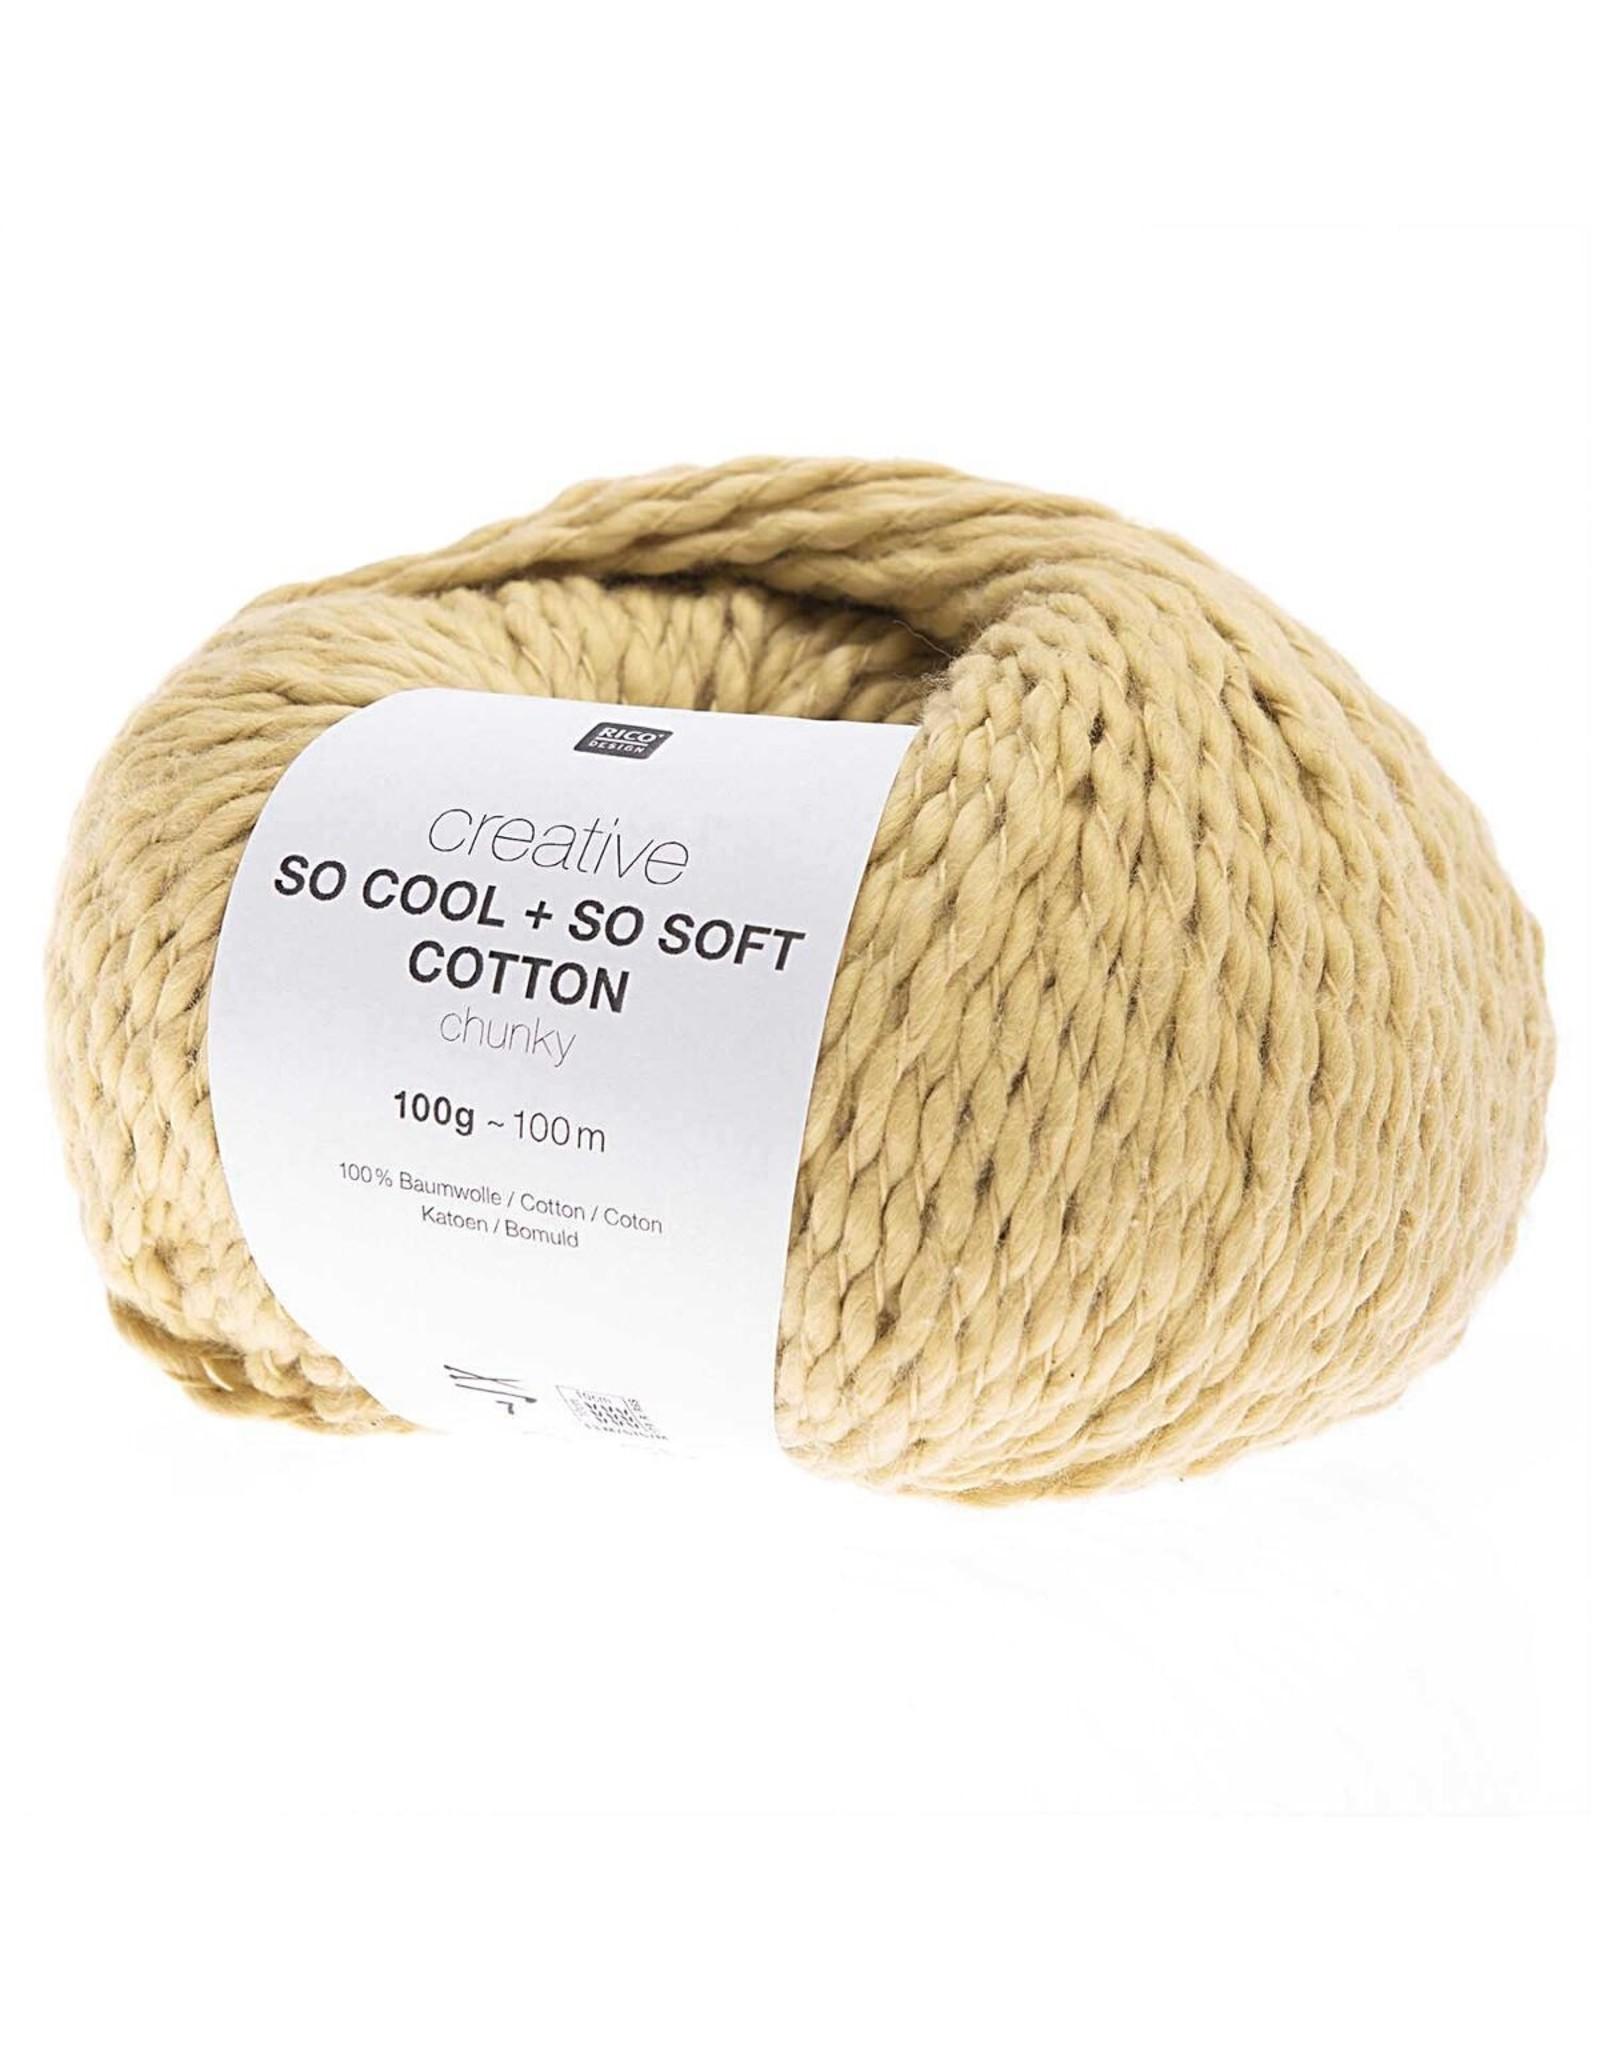 Rico Rico So Cool + So Soft Cotton Chunky